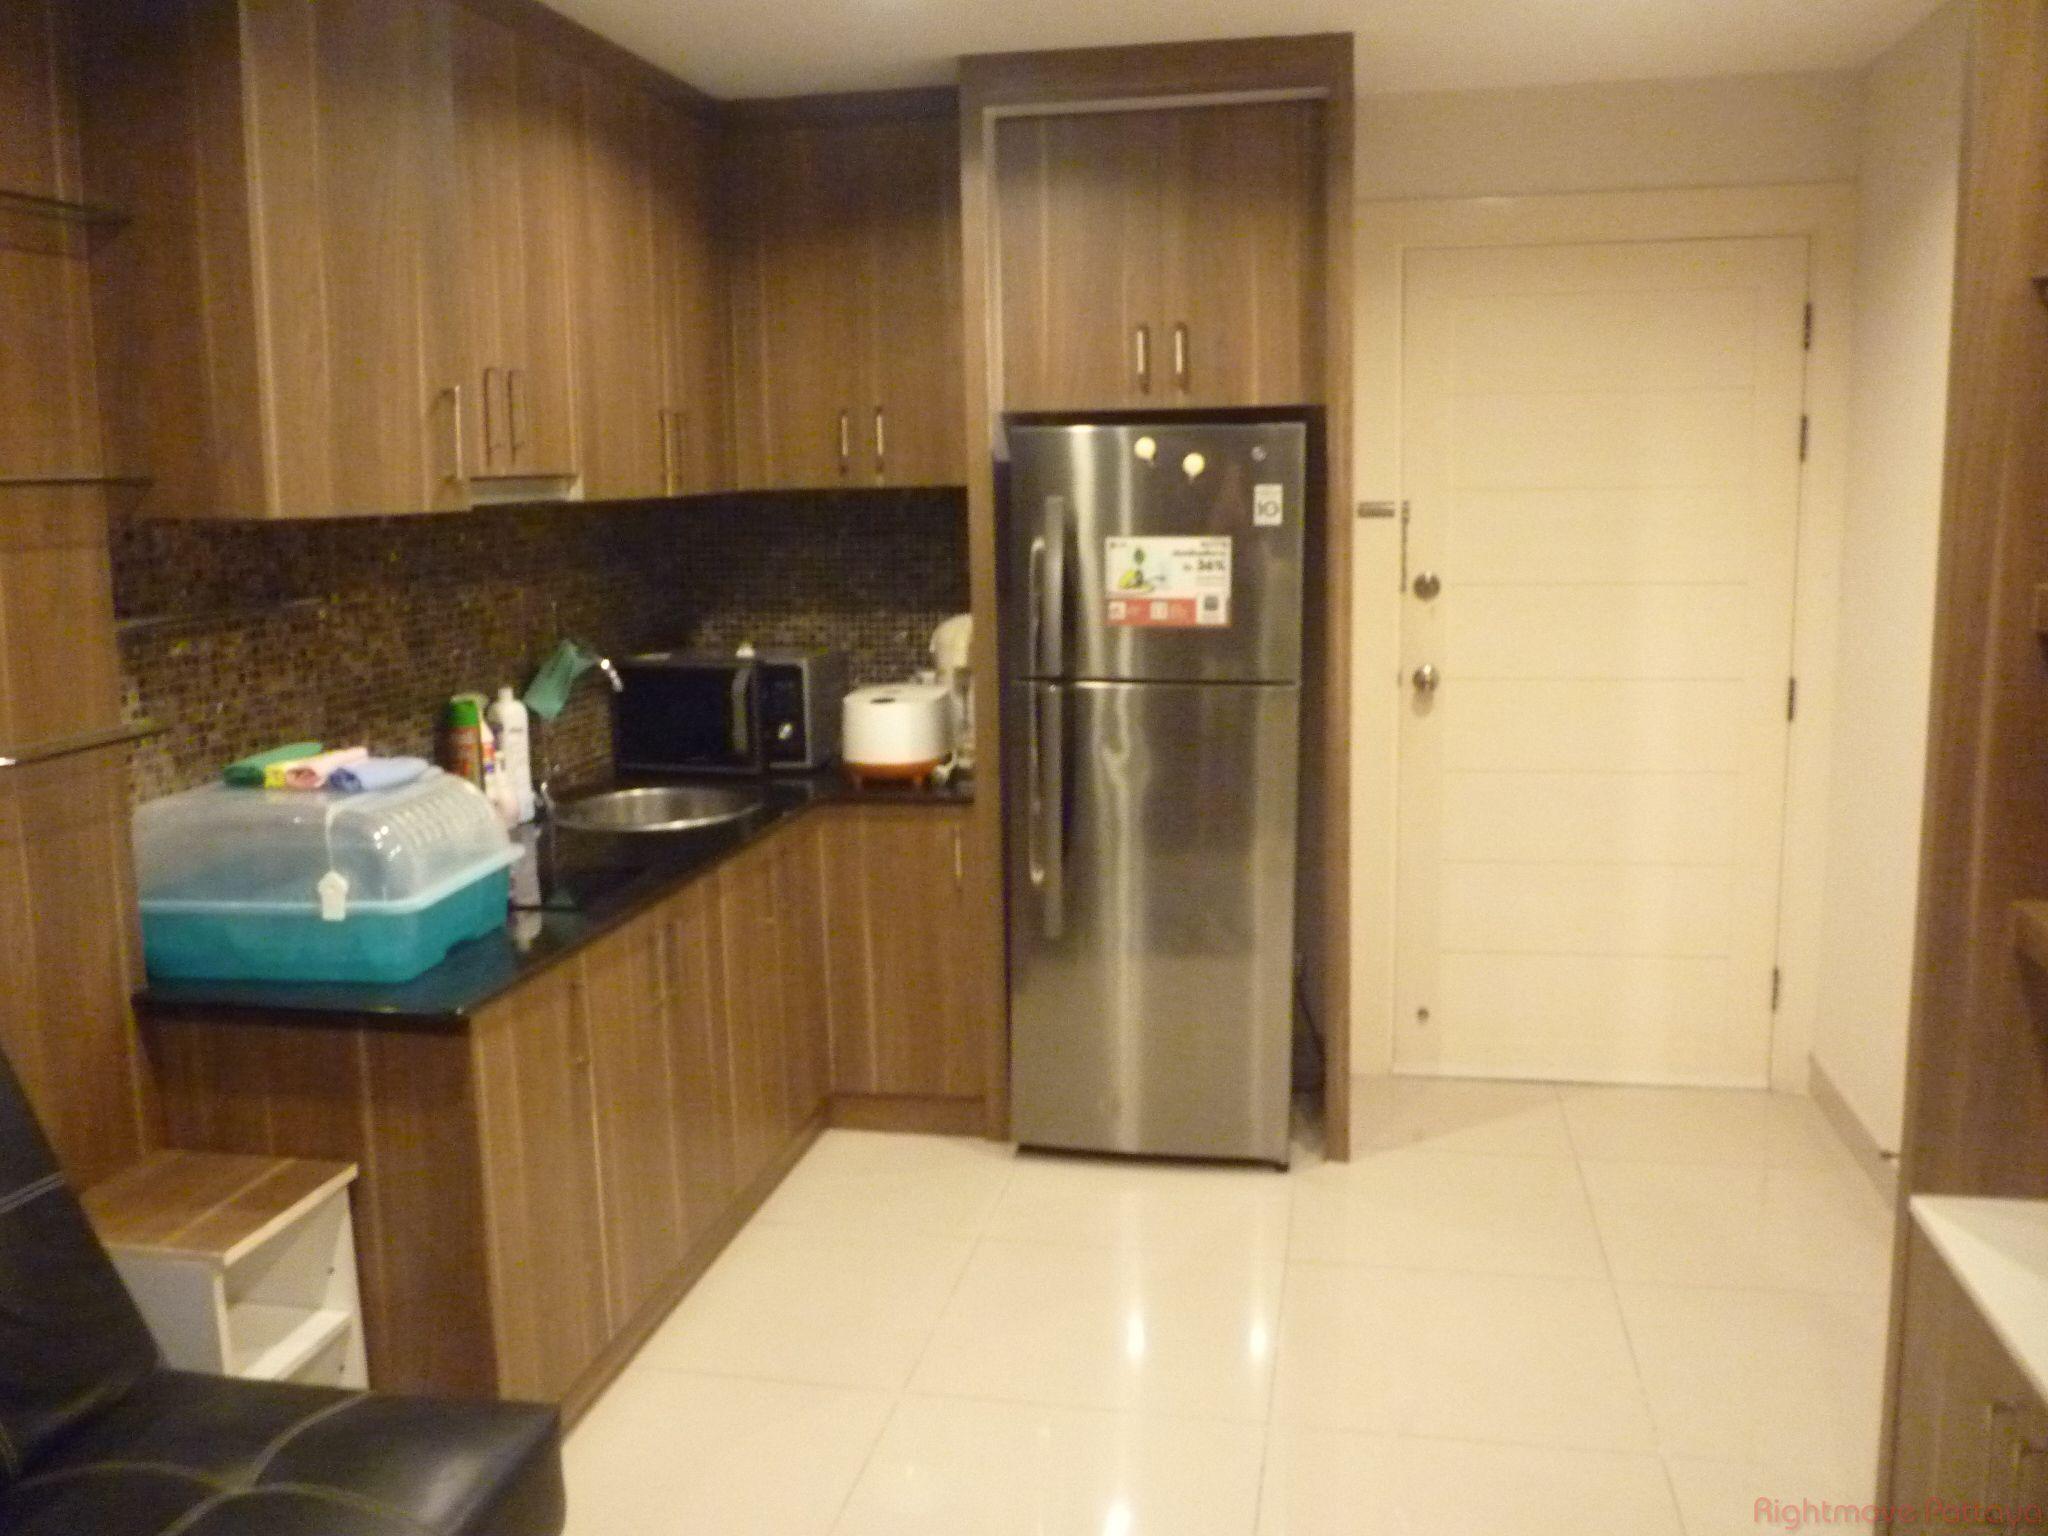 pic-5-Rightmove Pattaya Porchland 2 Jomtien Resort Condominiums for sale in Jomtien Pattaya